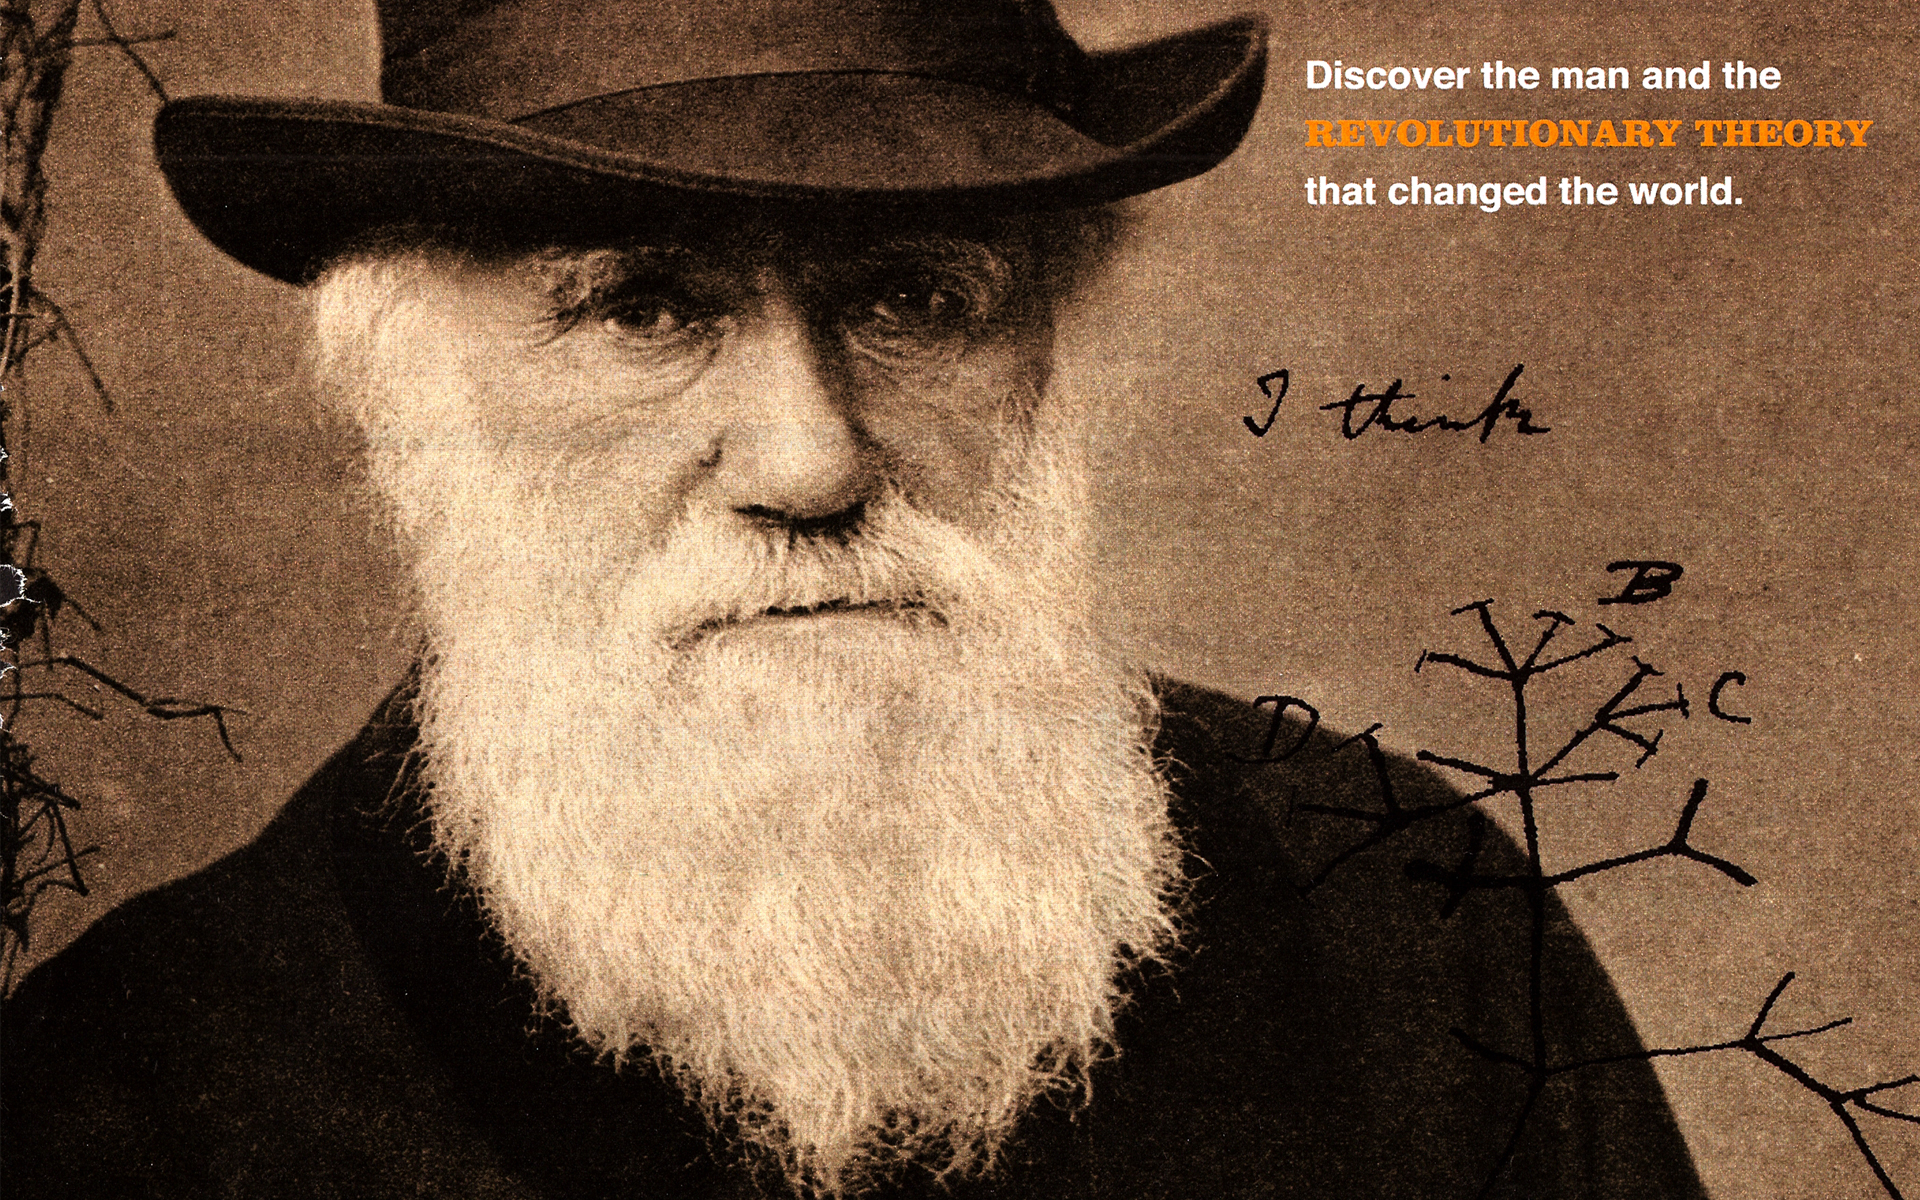 Charles Darwin wallpaper 1920x1200 61934 1920x1200